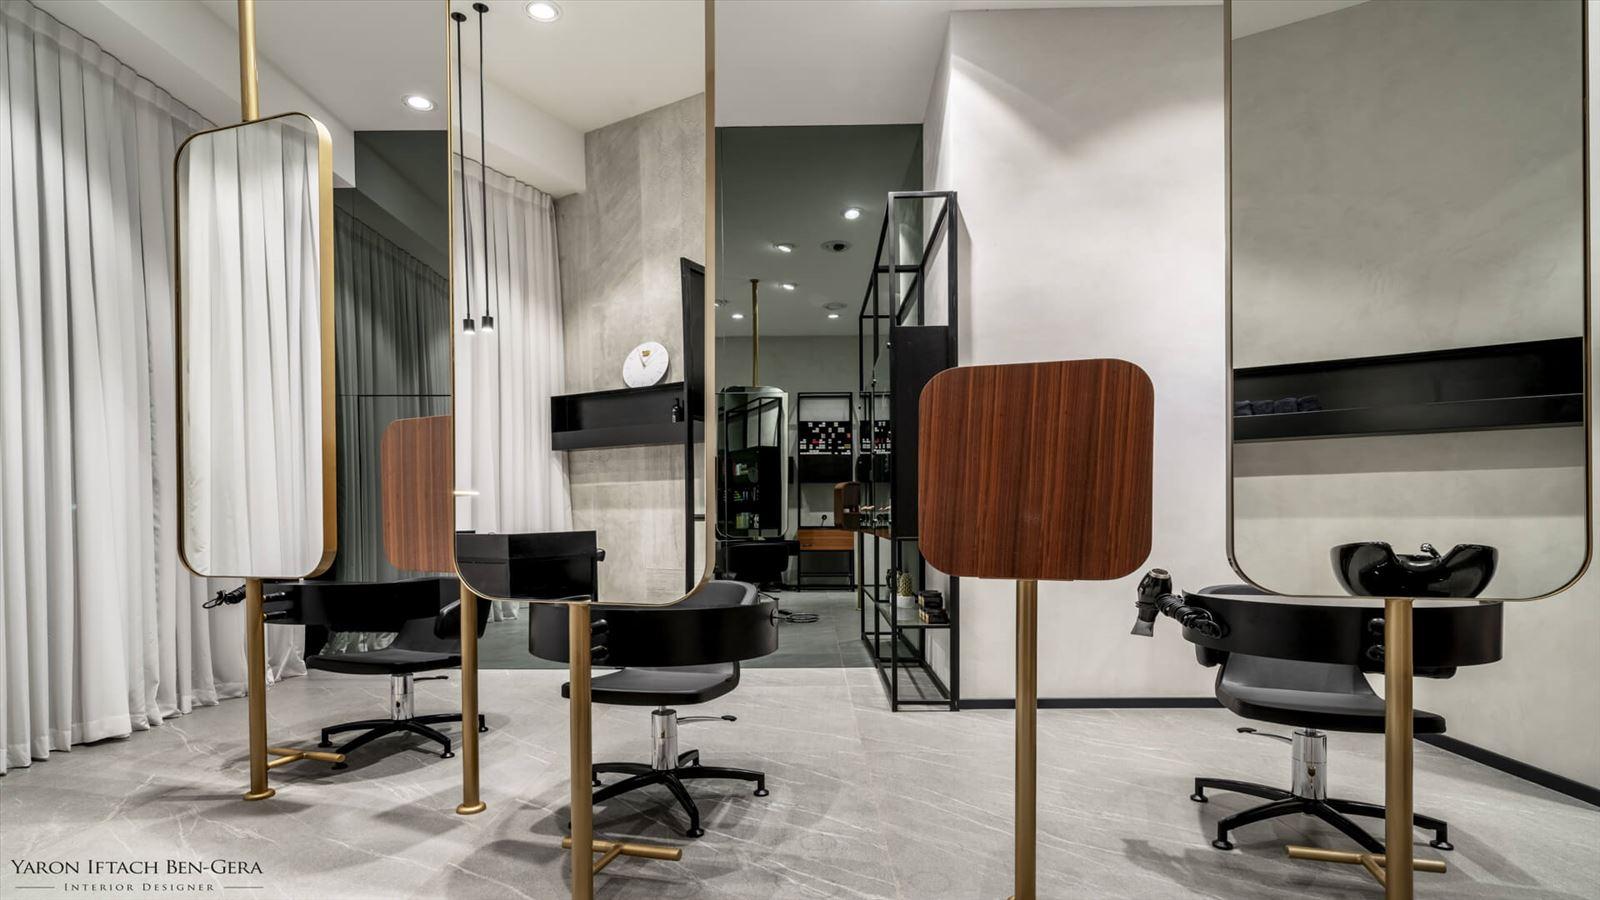 Boutique Hair Dressing Salon תאורת המספרה תוכננה ועוצבה על ידי דורי קמחי